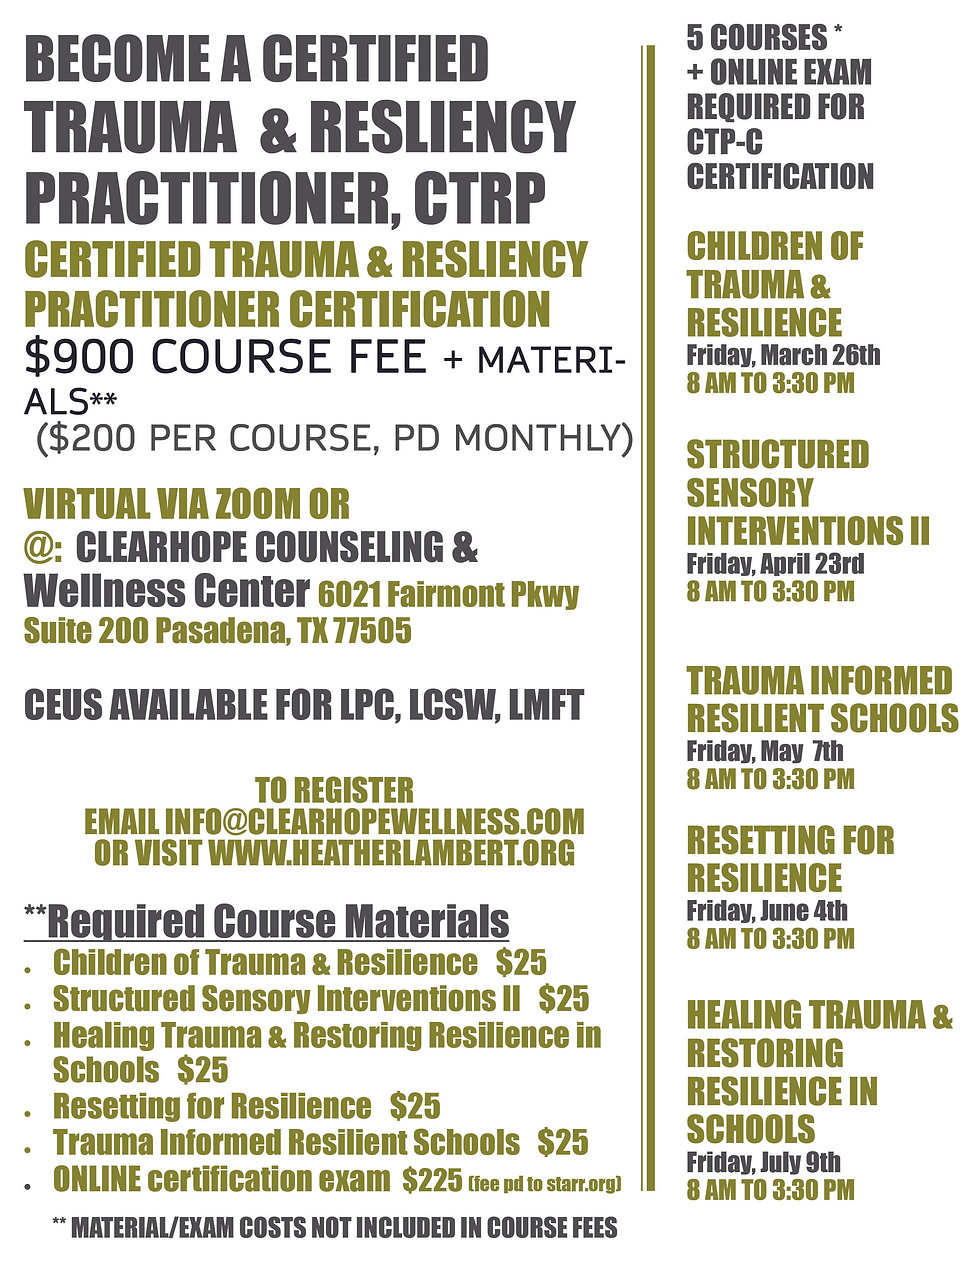 CTPC TLC Training Flyer Spring 2021.jpg